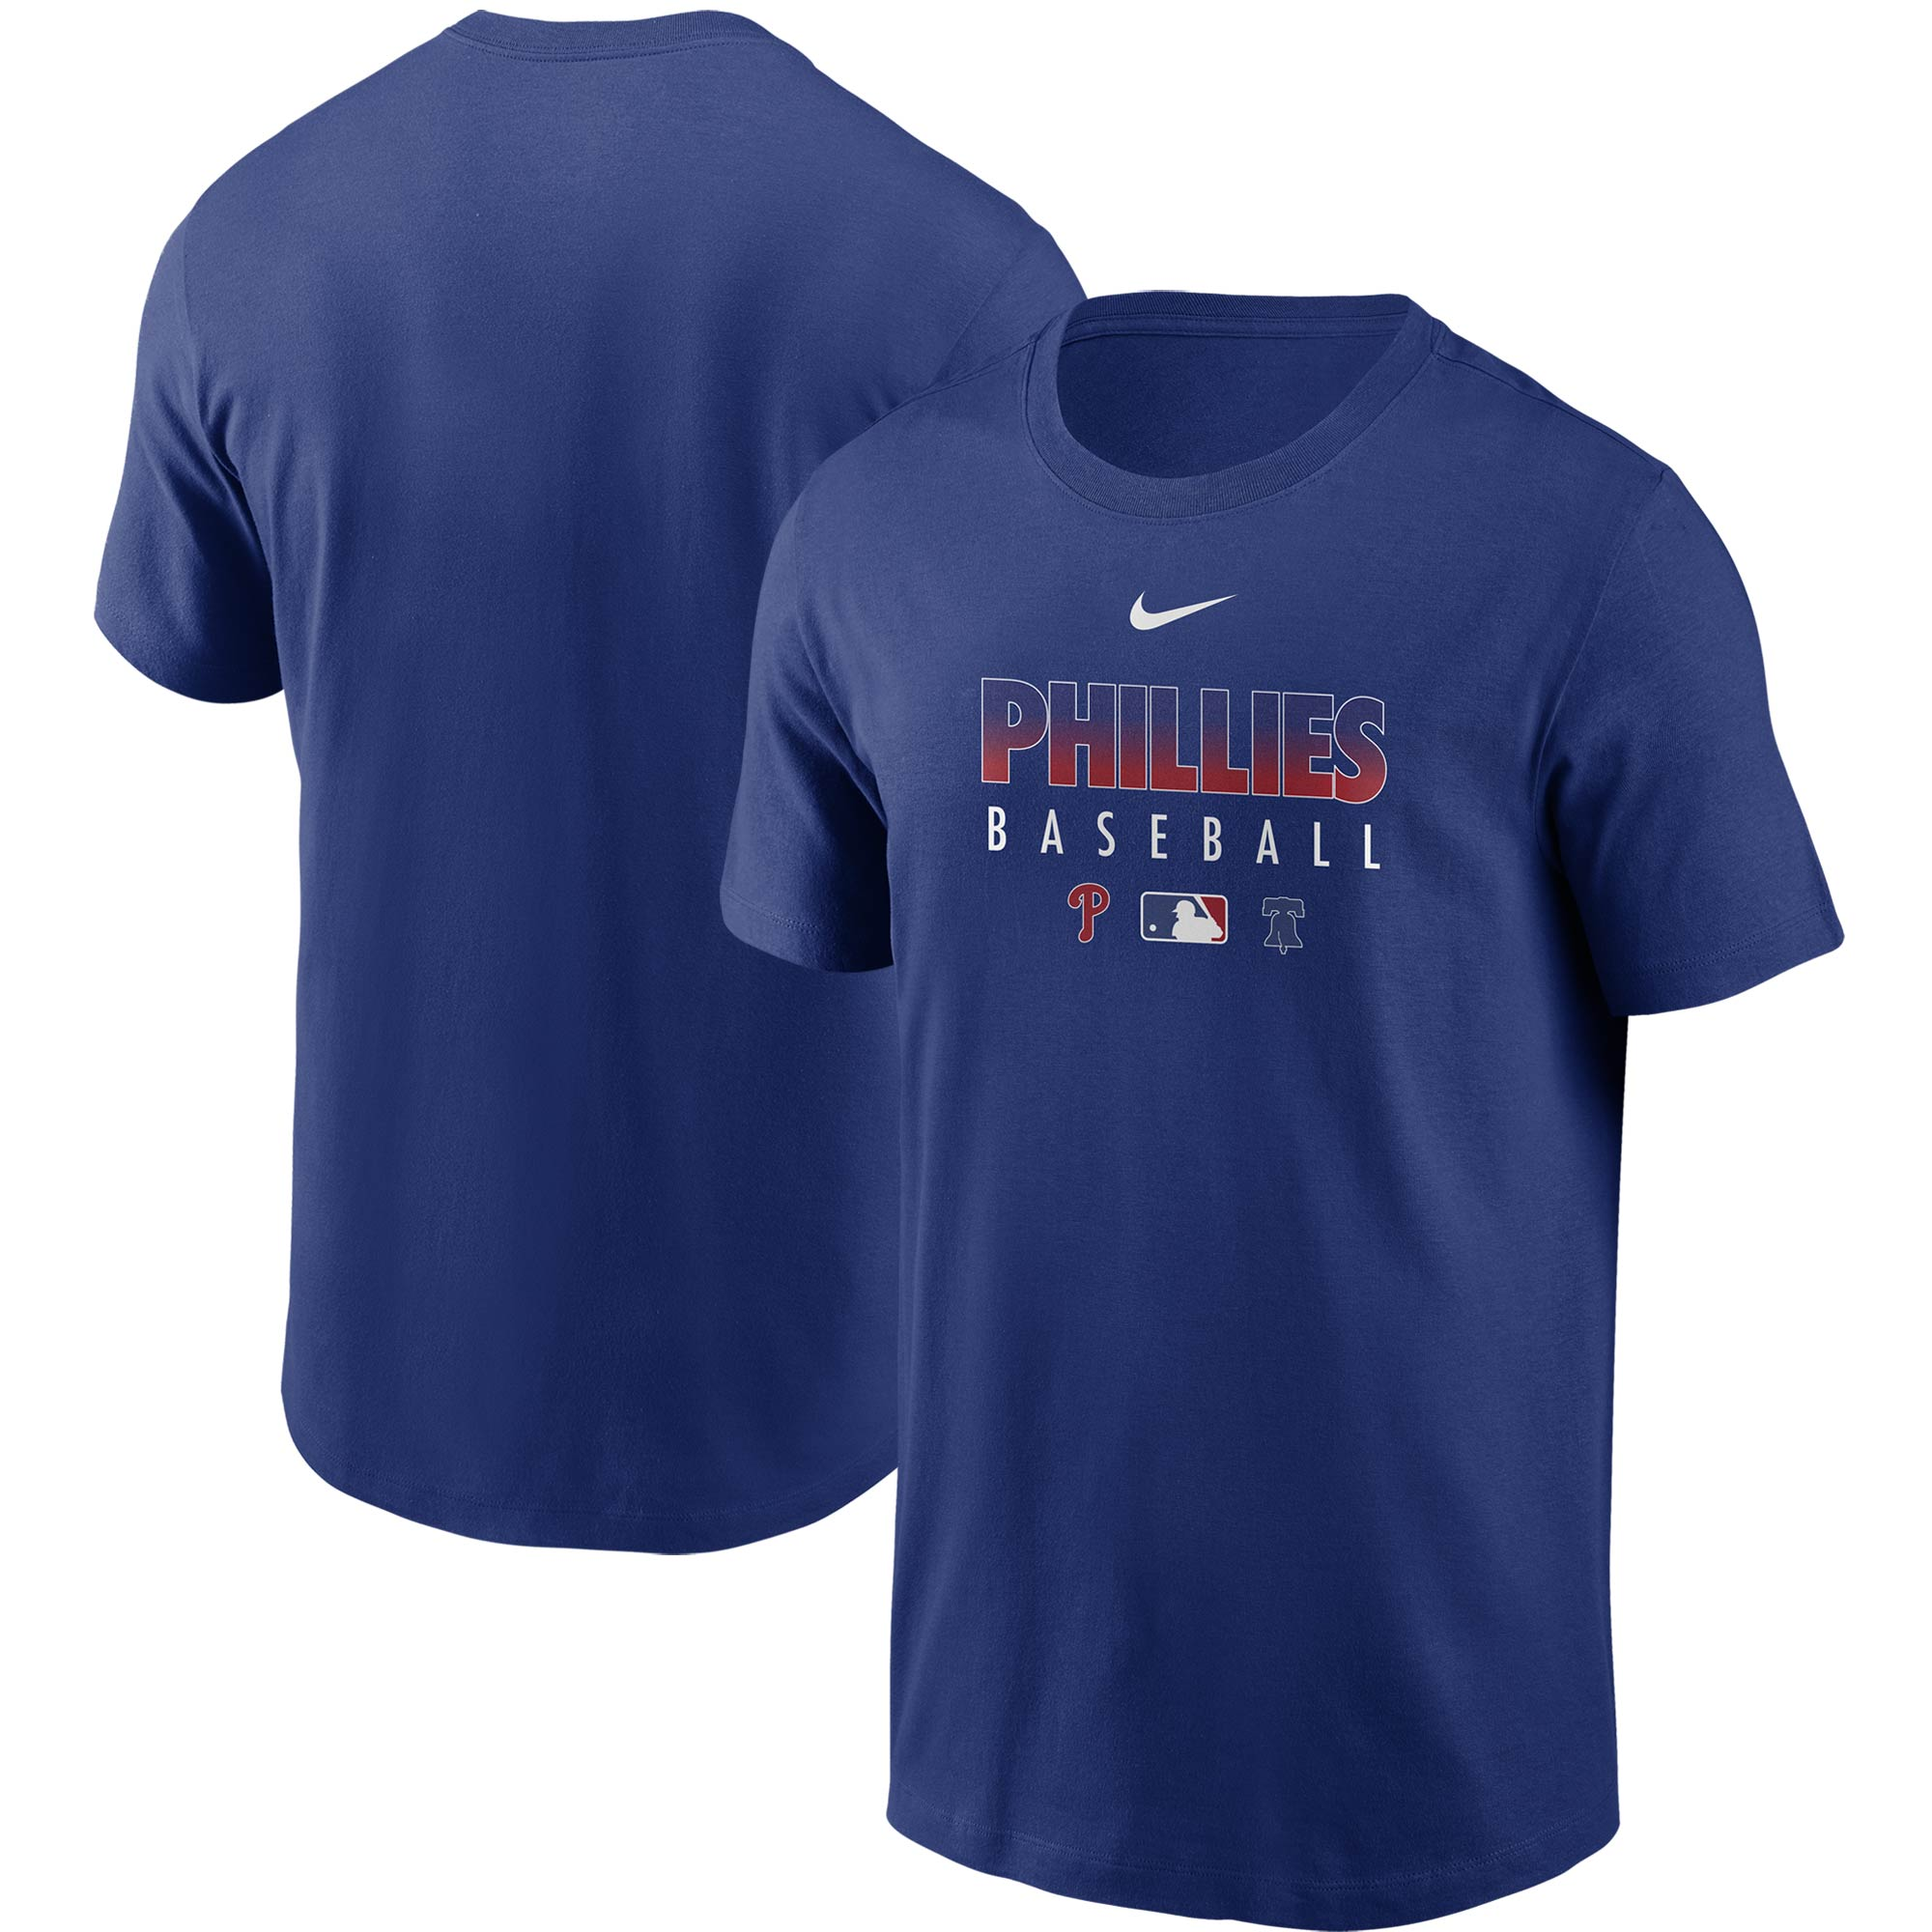 Philadelphia Phillies Nike Authentic Collection Team Performance T-Shirt - Royal